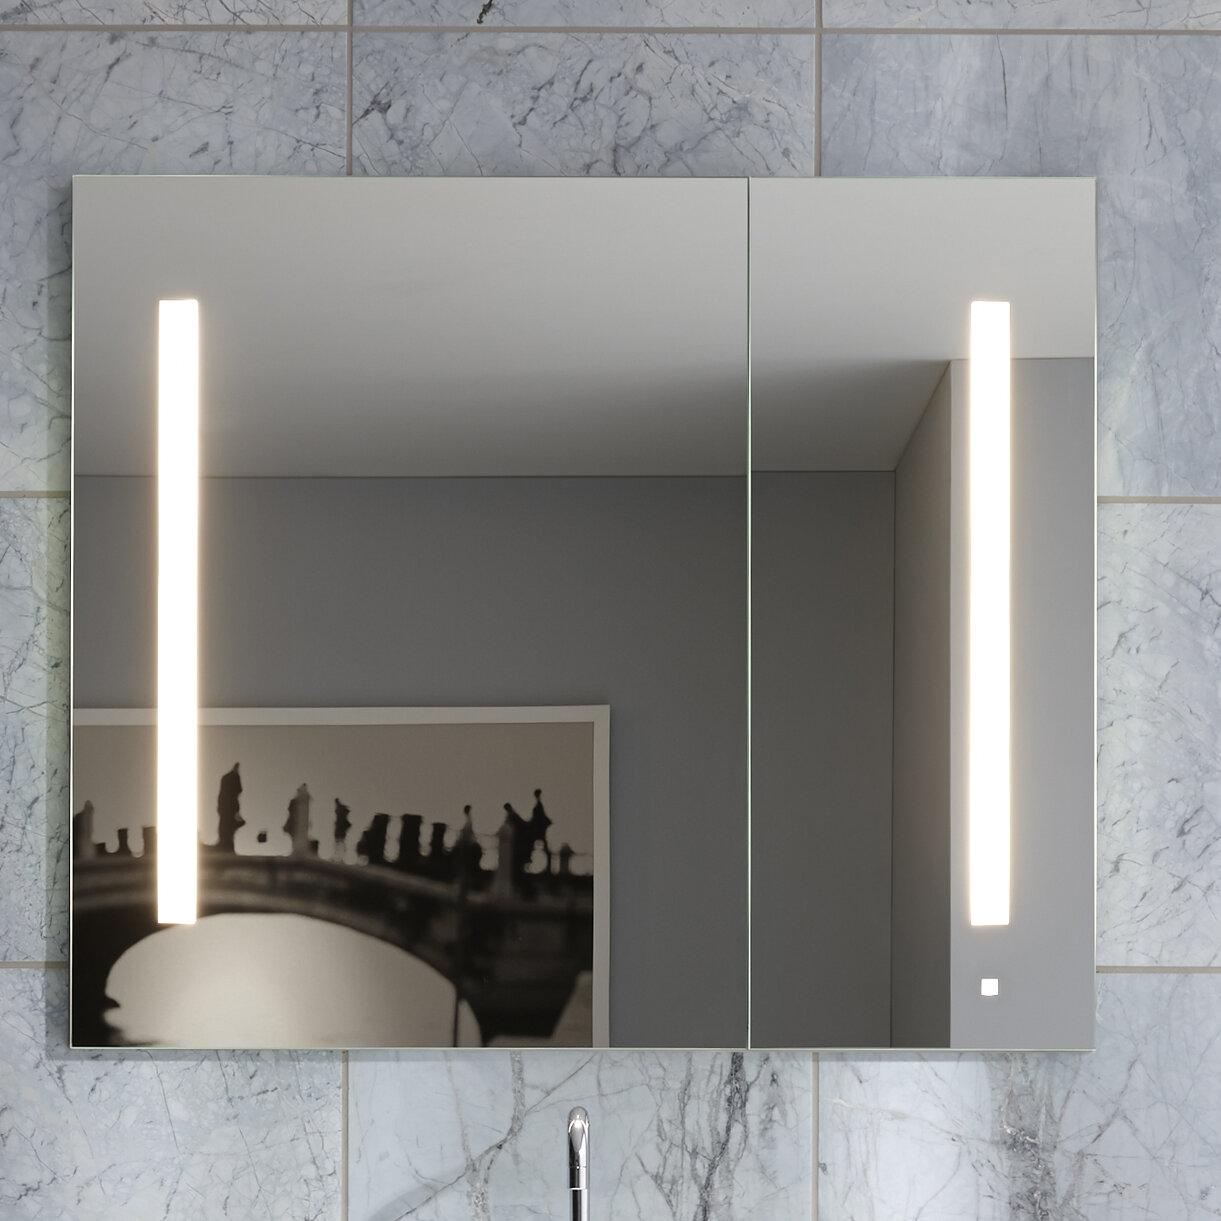 Ac3630d4p2la Aio 35 25 X 30 Recessed Medicine Cabinet With Lighting